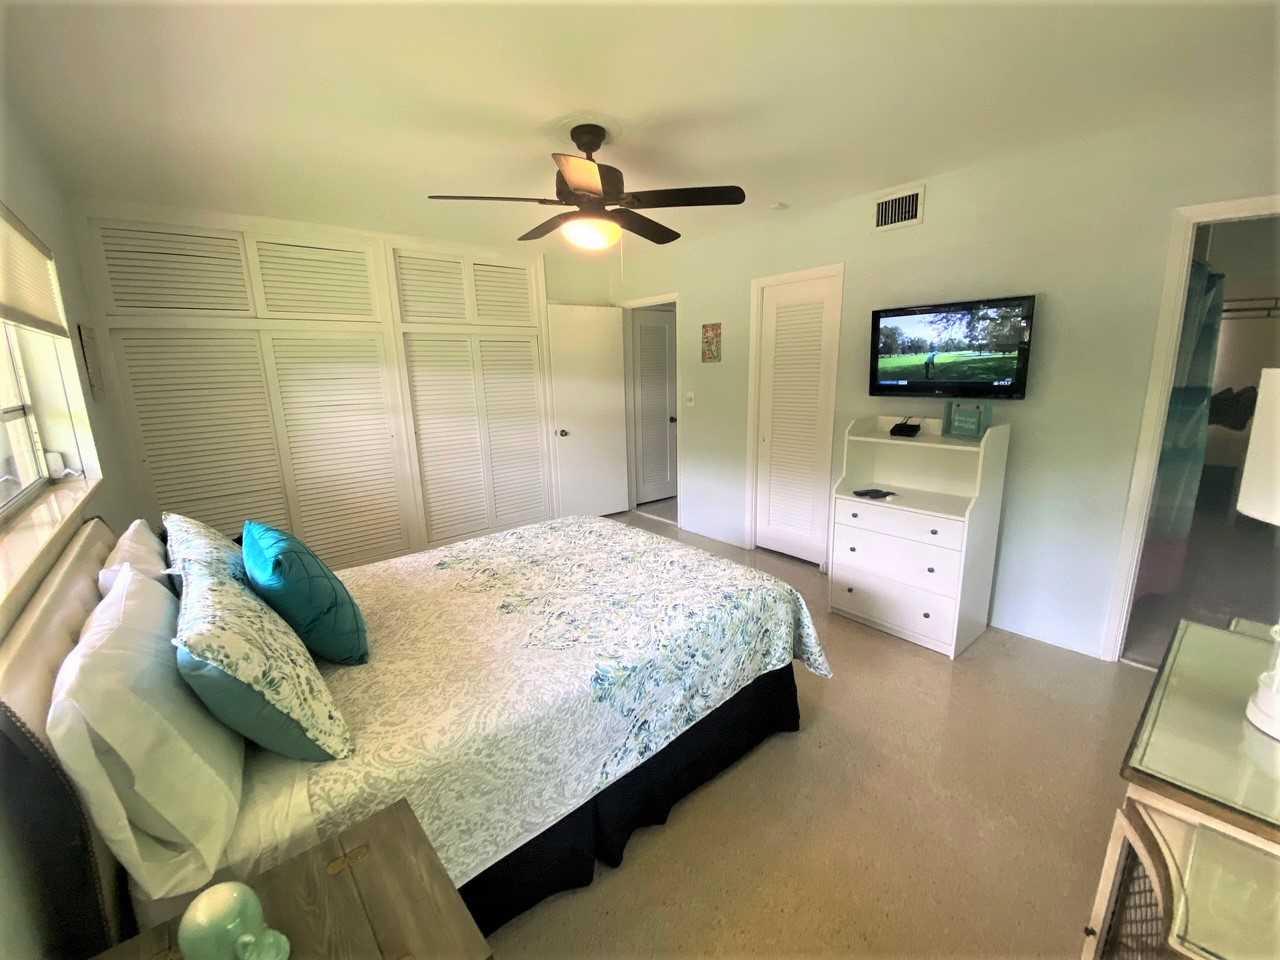 Third bedroom also has HDTV.